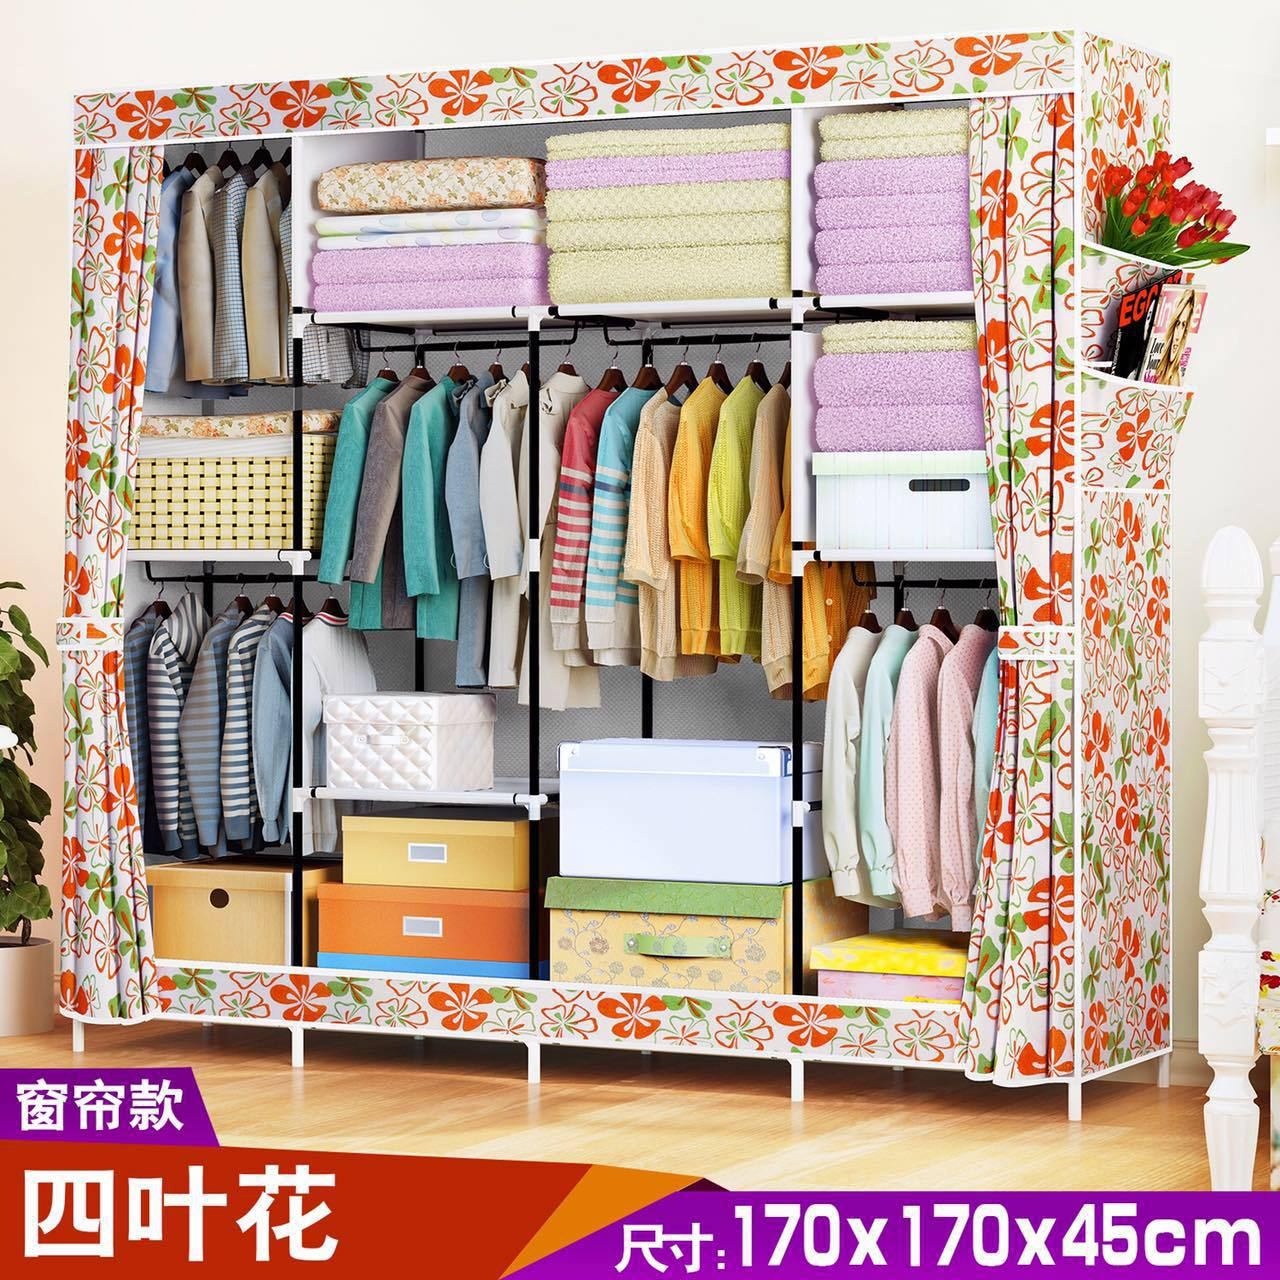 Шкаф гардероб тканевый сборный 4 секции 170х170х45 на заказ .